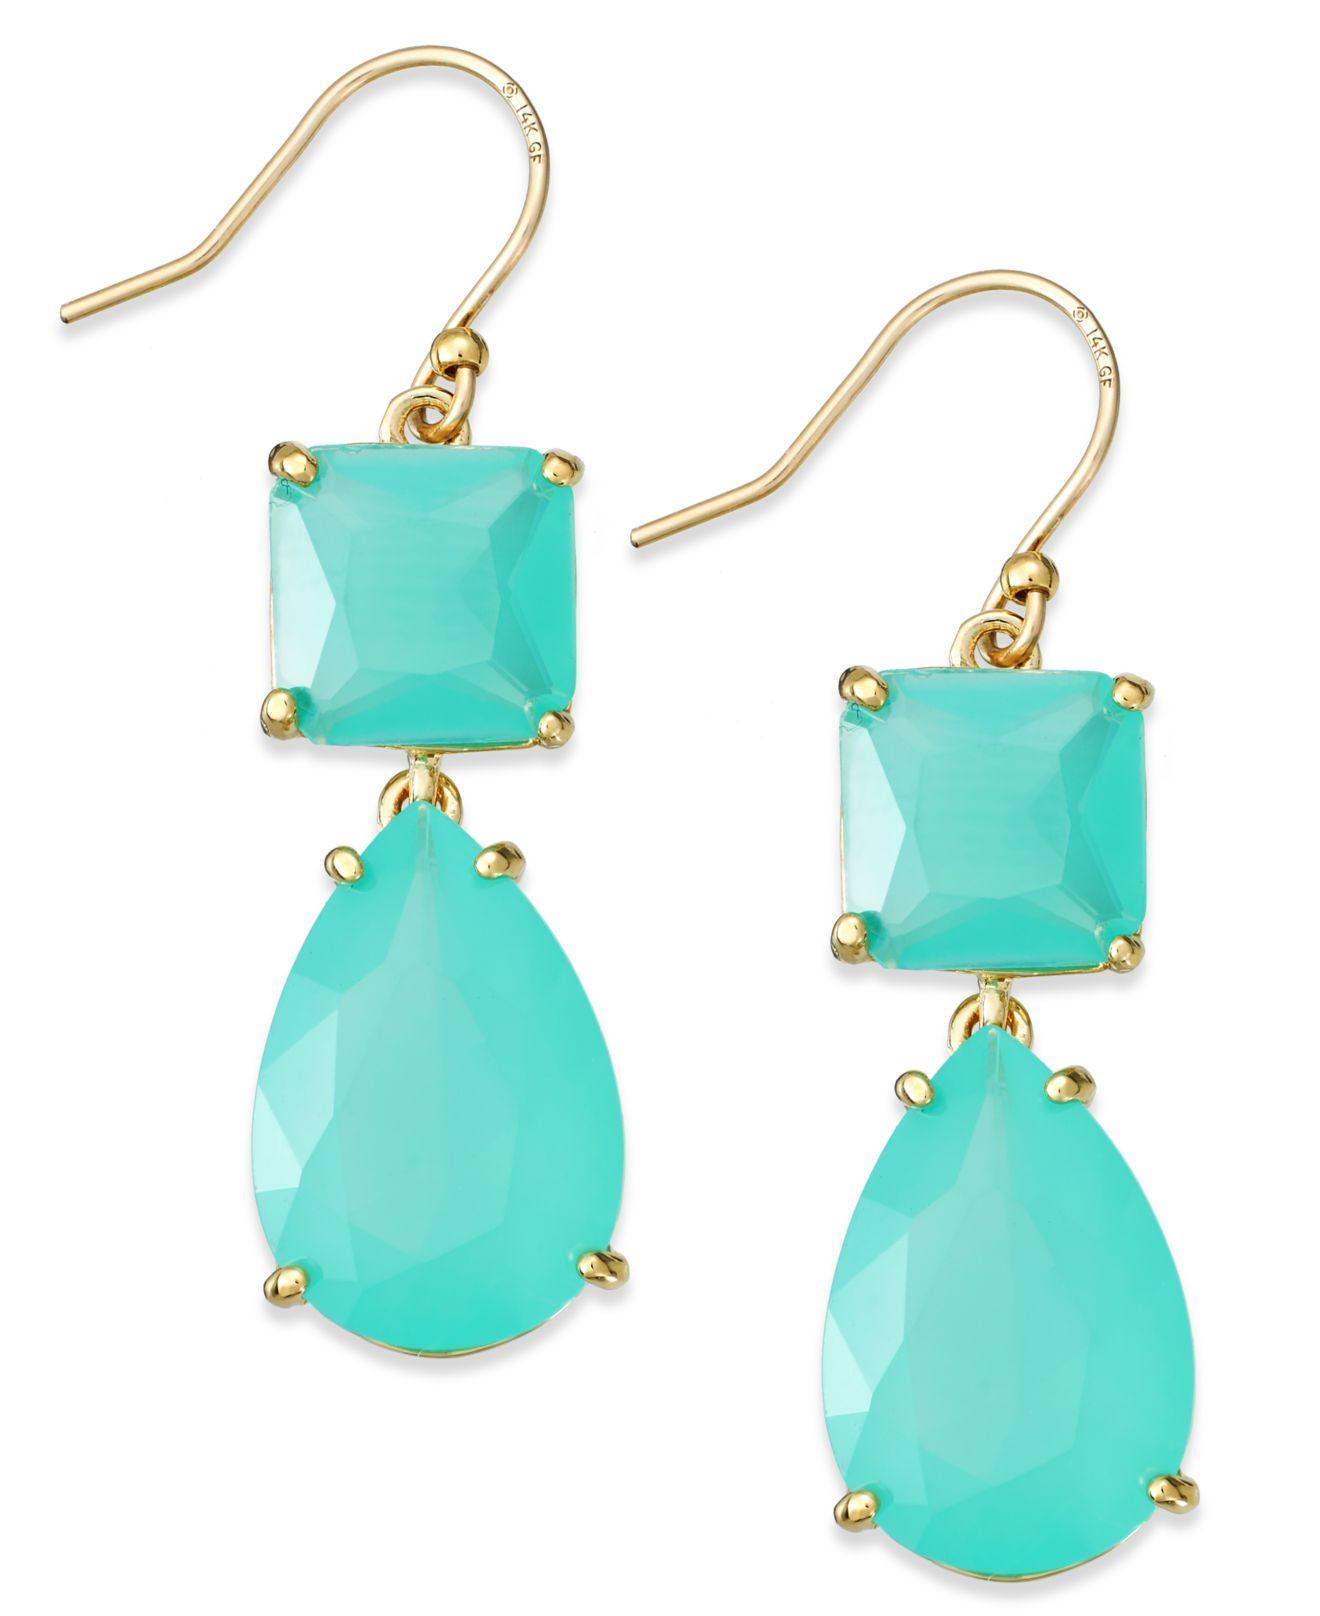 Kate Spade Turquoise Earrings Best All Earring Photos Kamiliol